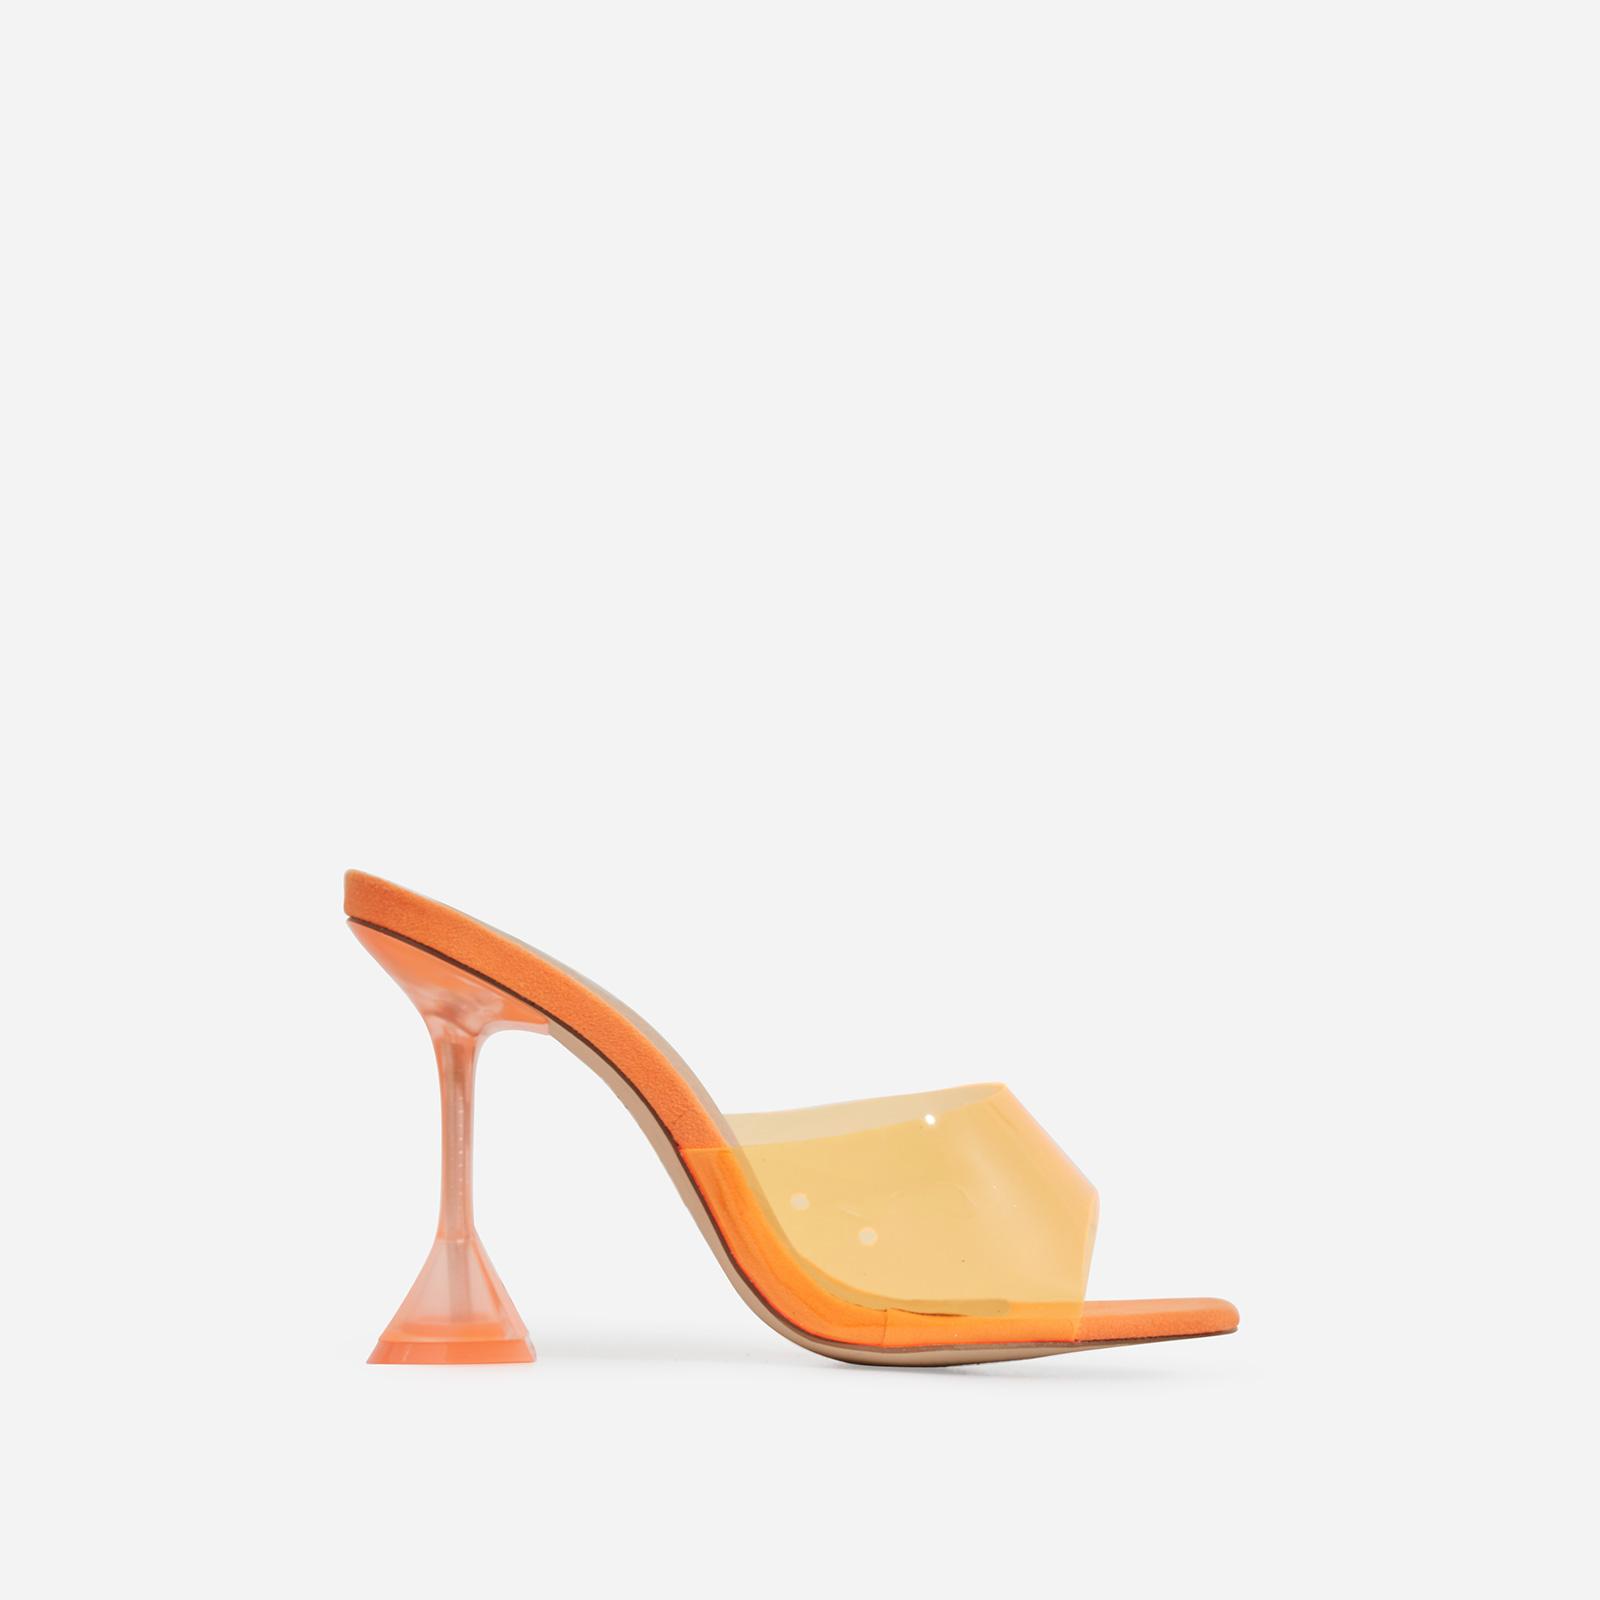 Lila Square Toe Perspex Heel Mule In Orange Faux Suede